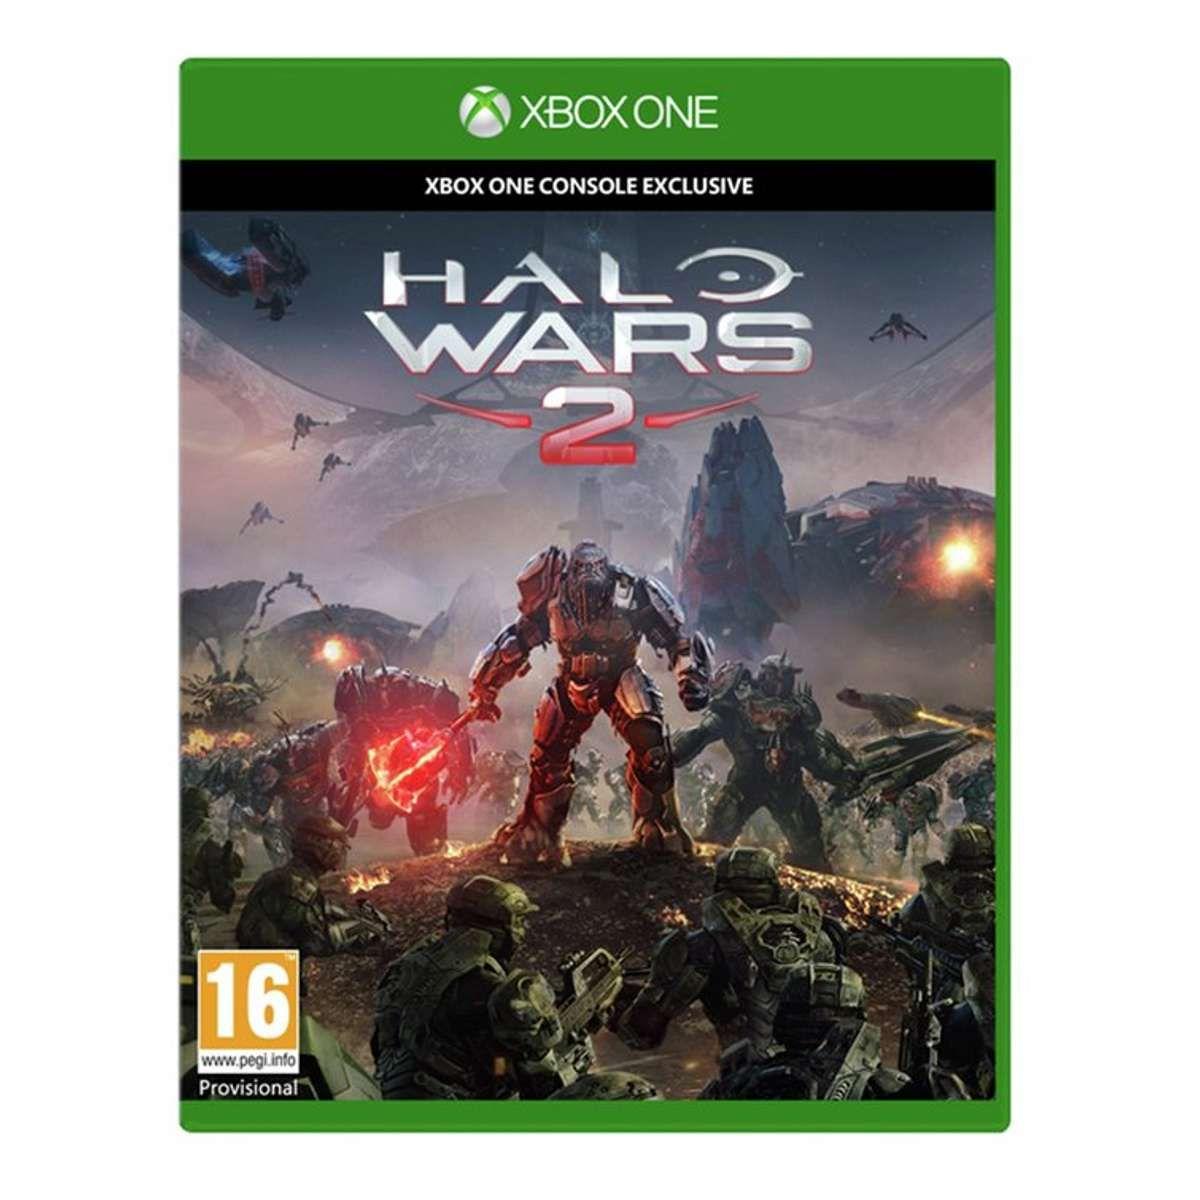 Microsoft Halo wars 2 for X Box oneFor £6.99 Free B&C @ Hughes